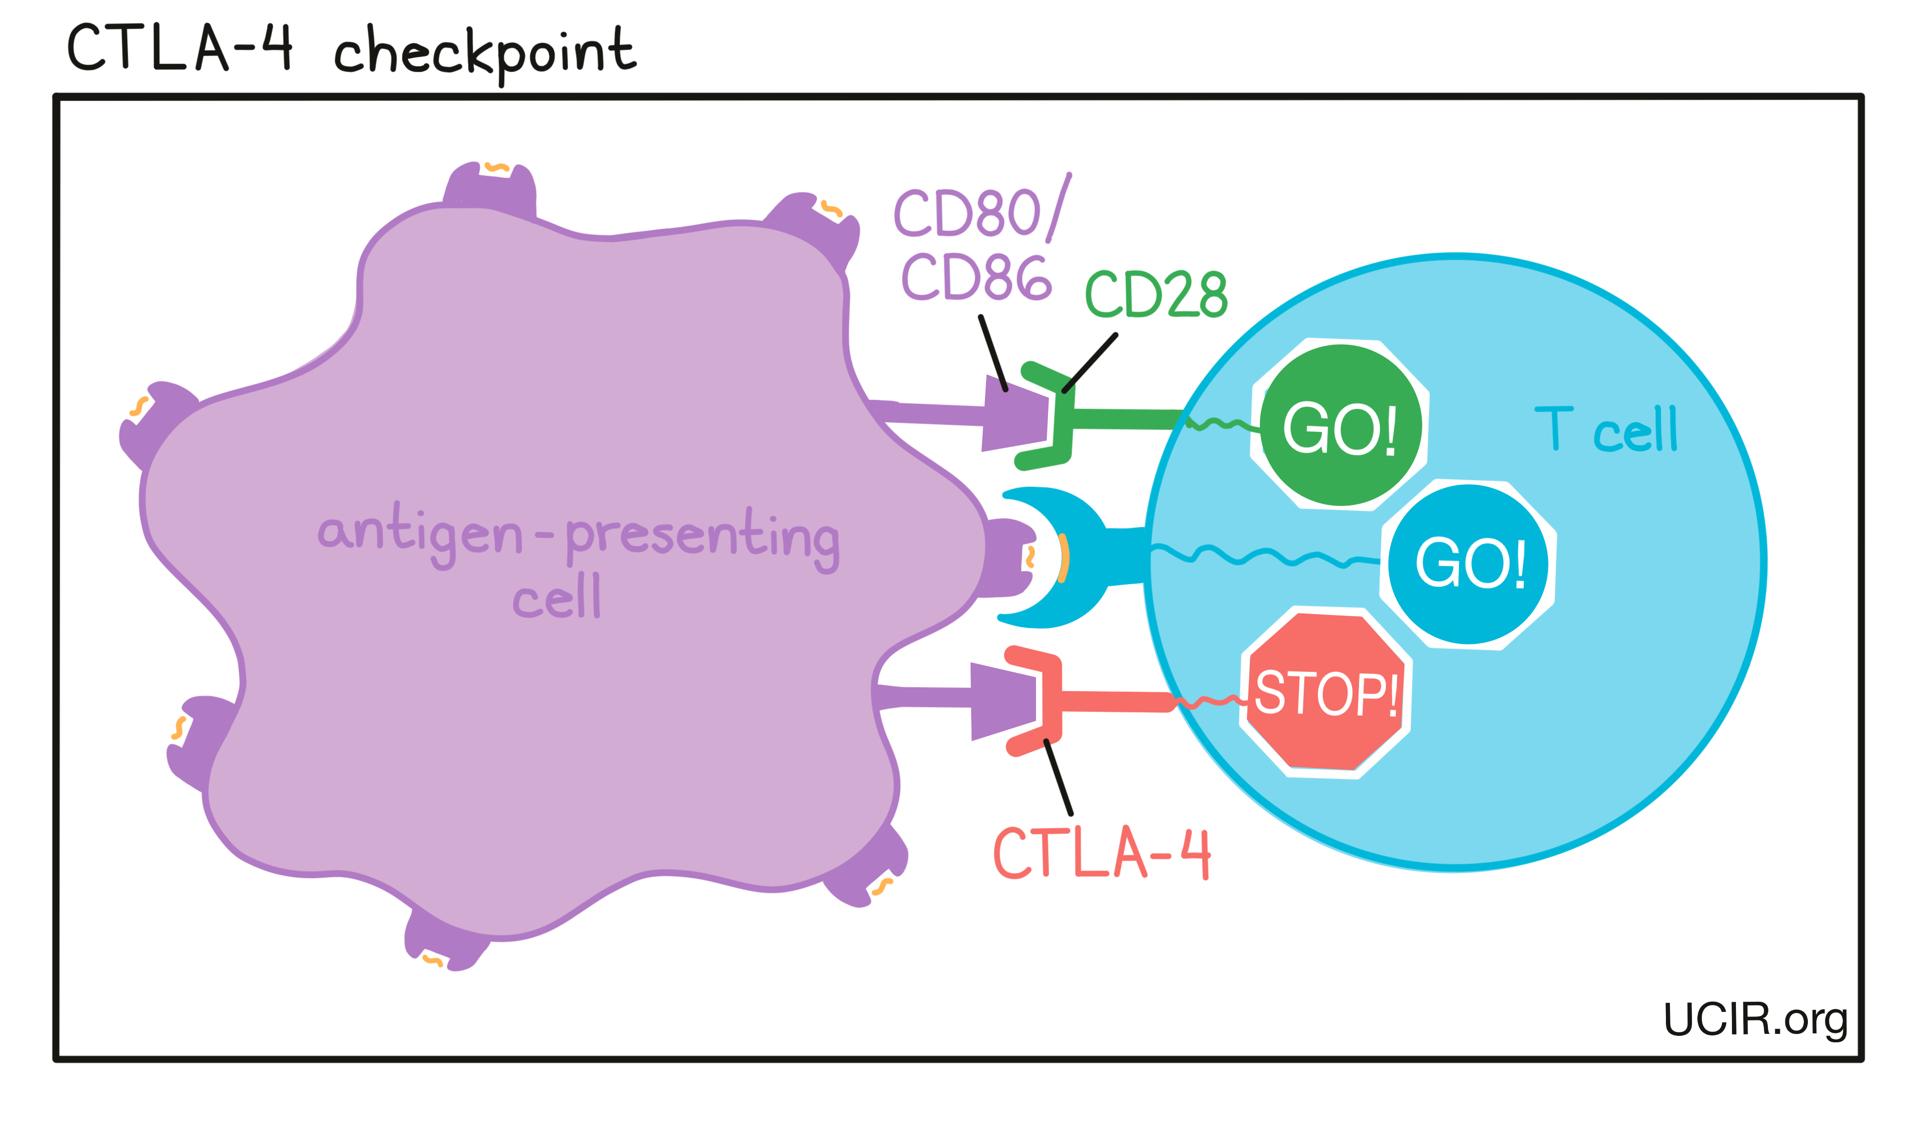 CTLA-4 checkpoint illustration